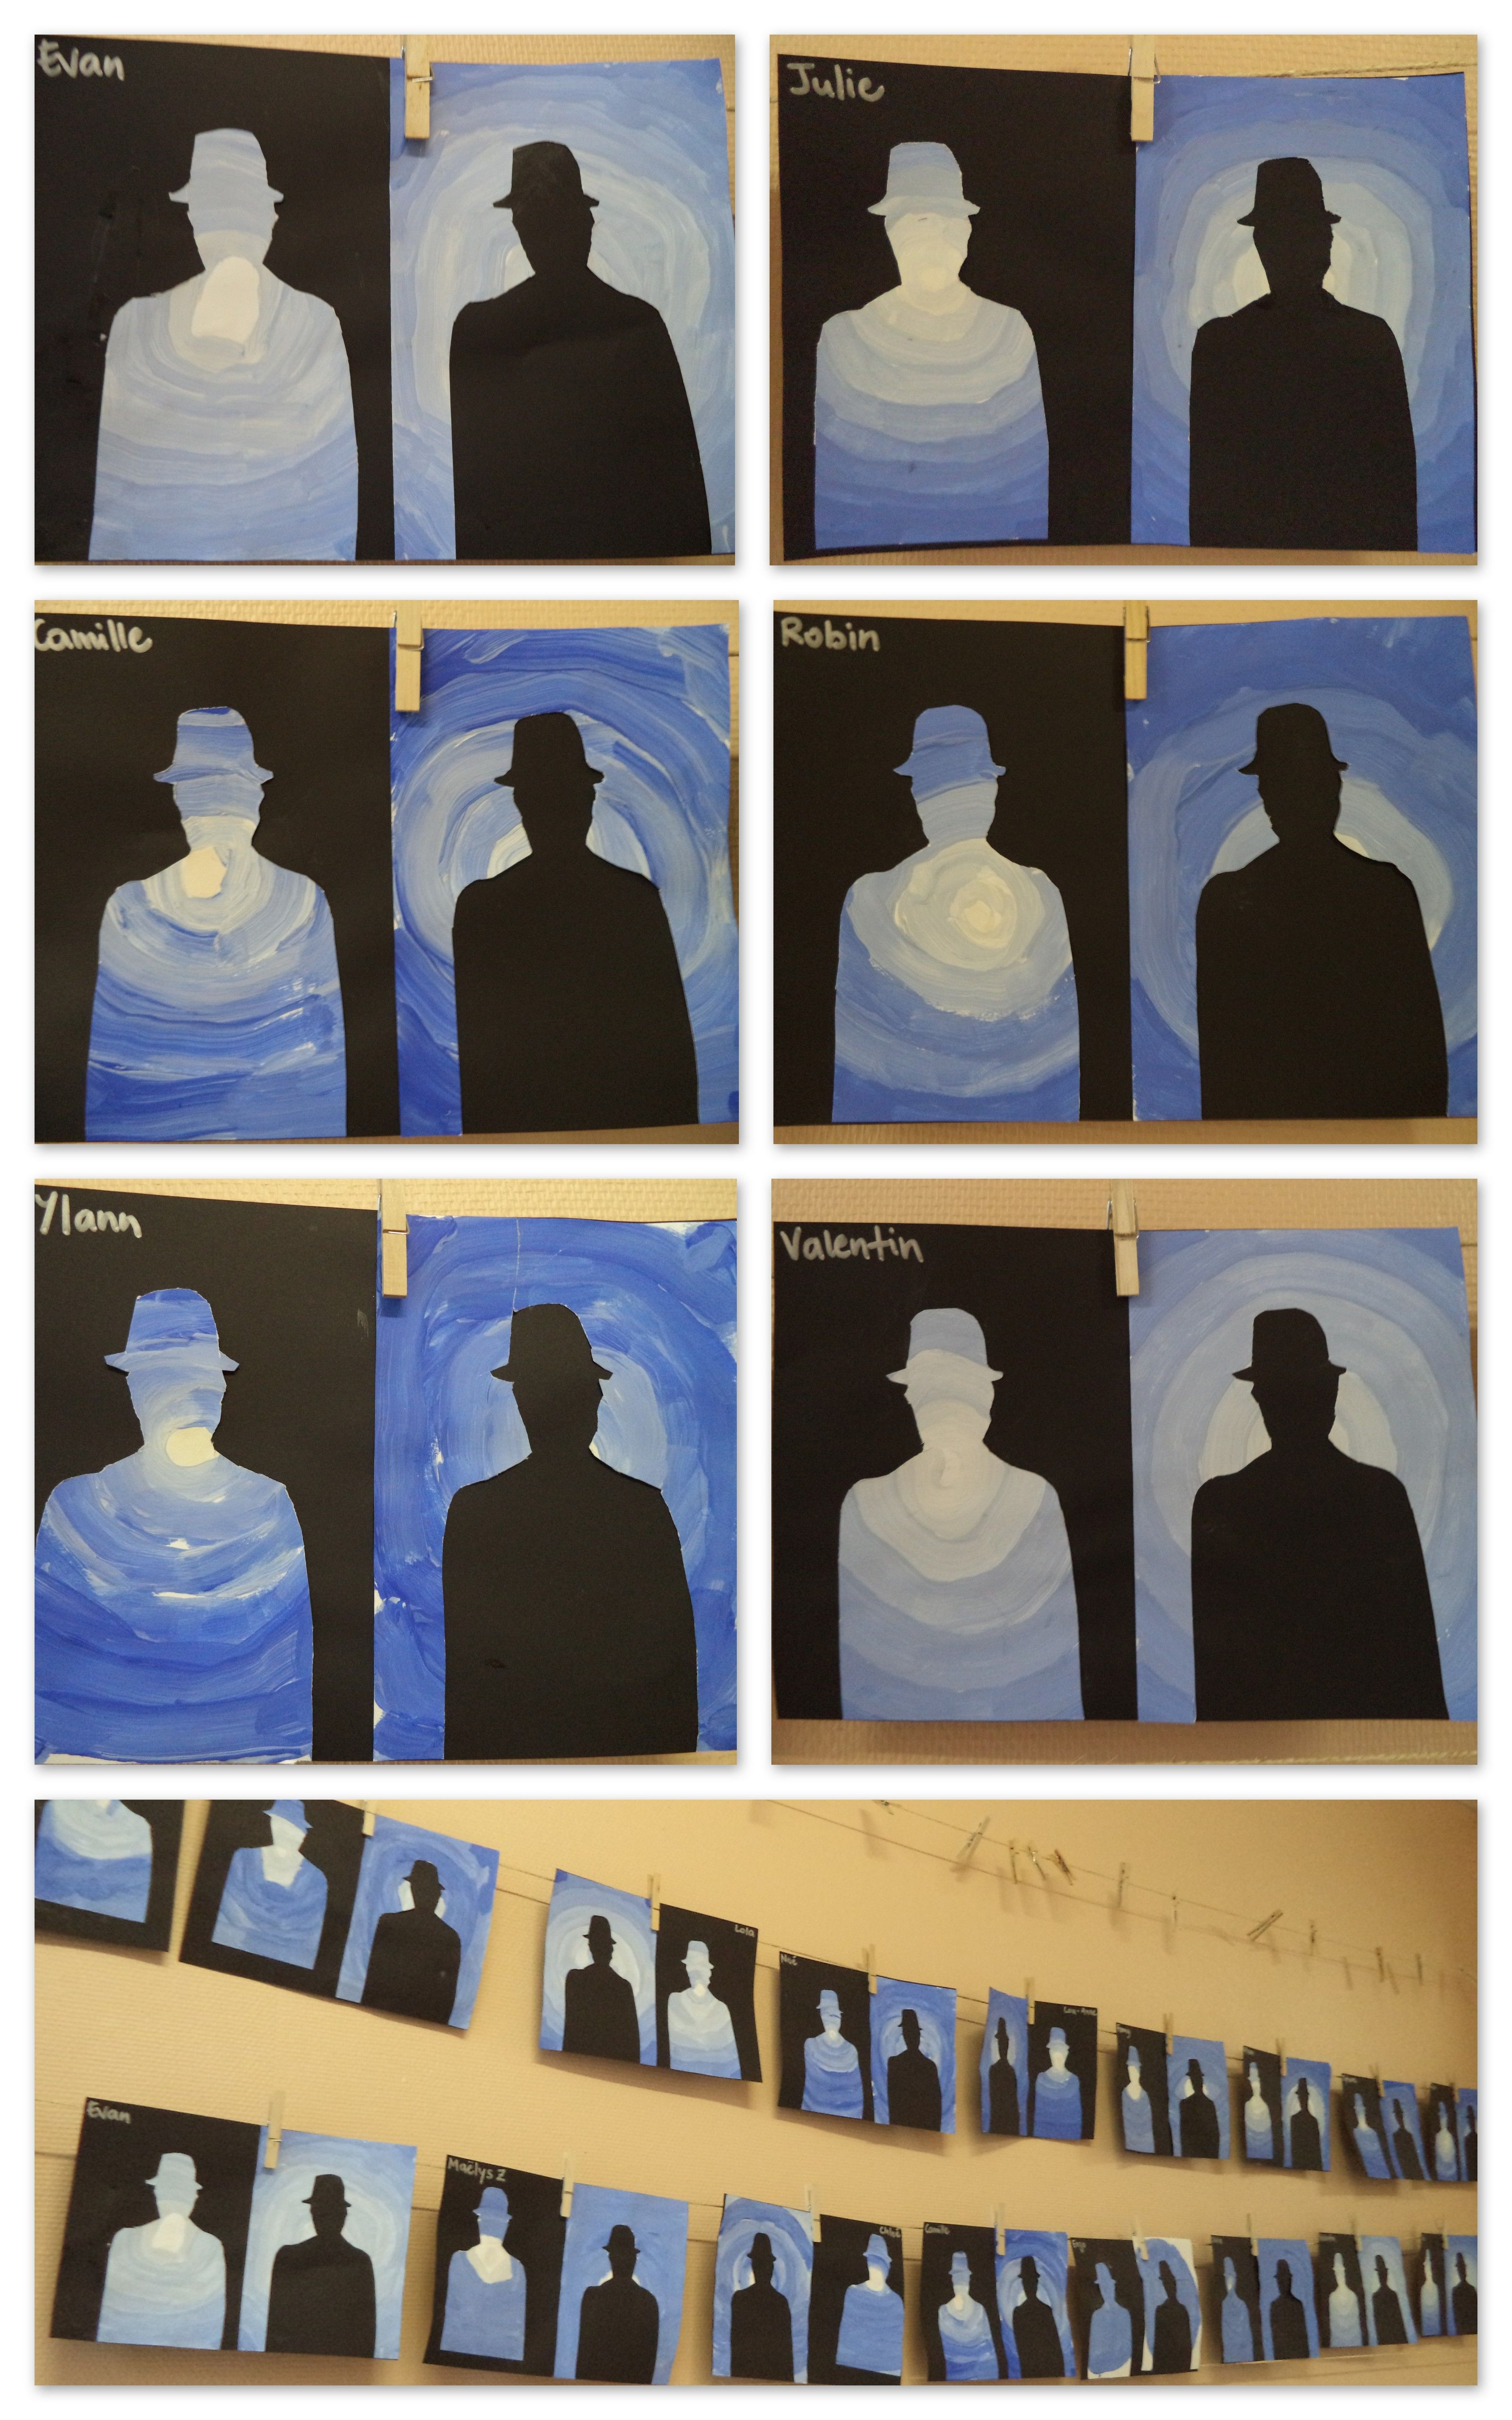 E5gtsr9sg8ij9 X8 8bngjqhr14 Jpg 3 200 5 120 Pixels Kunst Grundschule Kunst Unterrichten Kunst